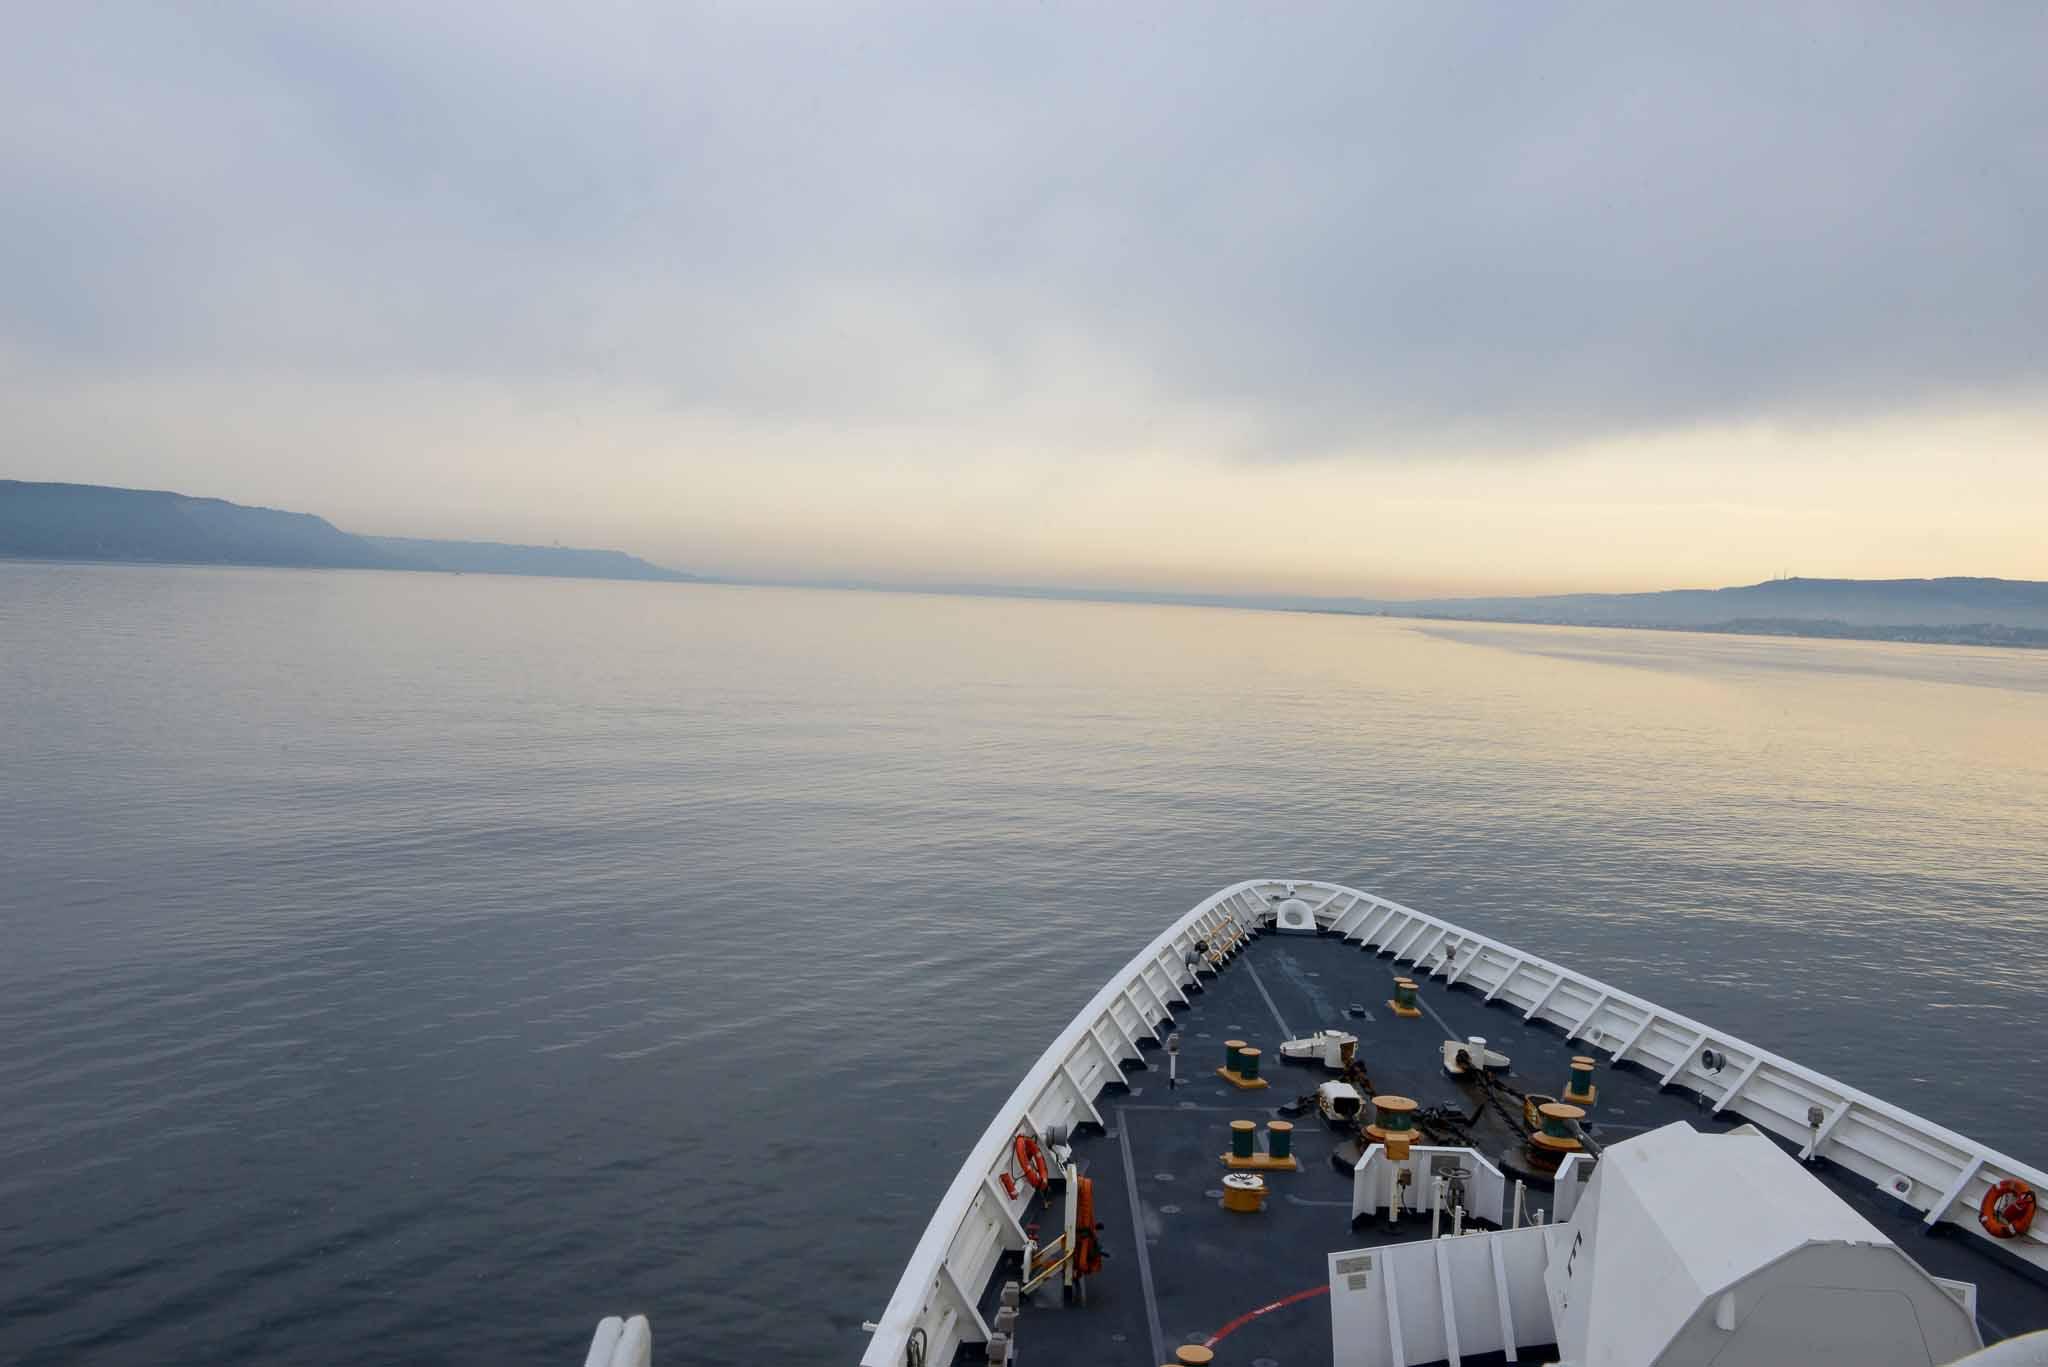 U.S. coast guard cutter enters Black Sea first time since 2008 / Twitter